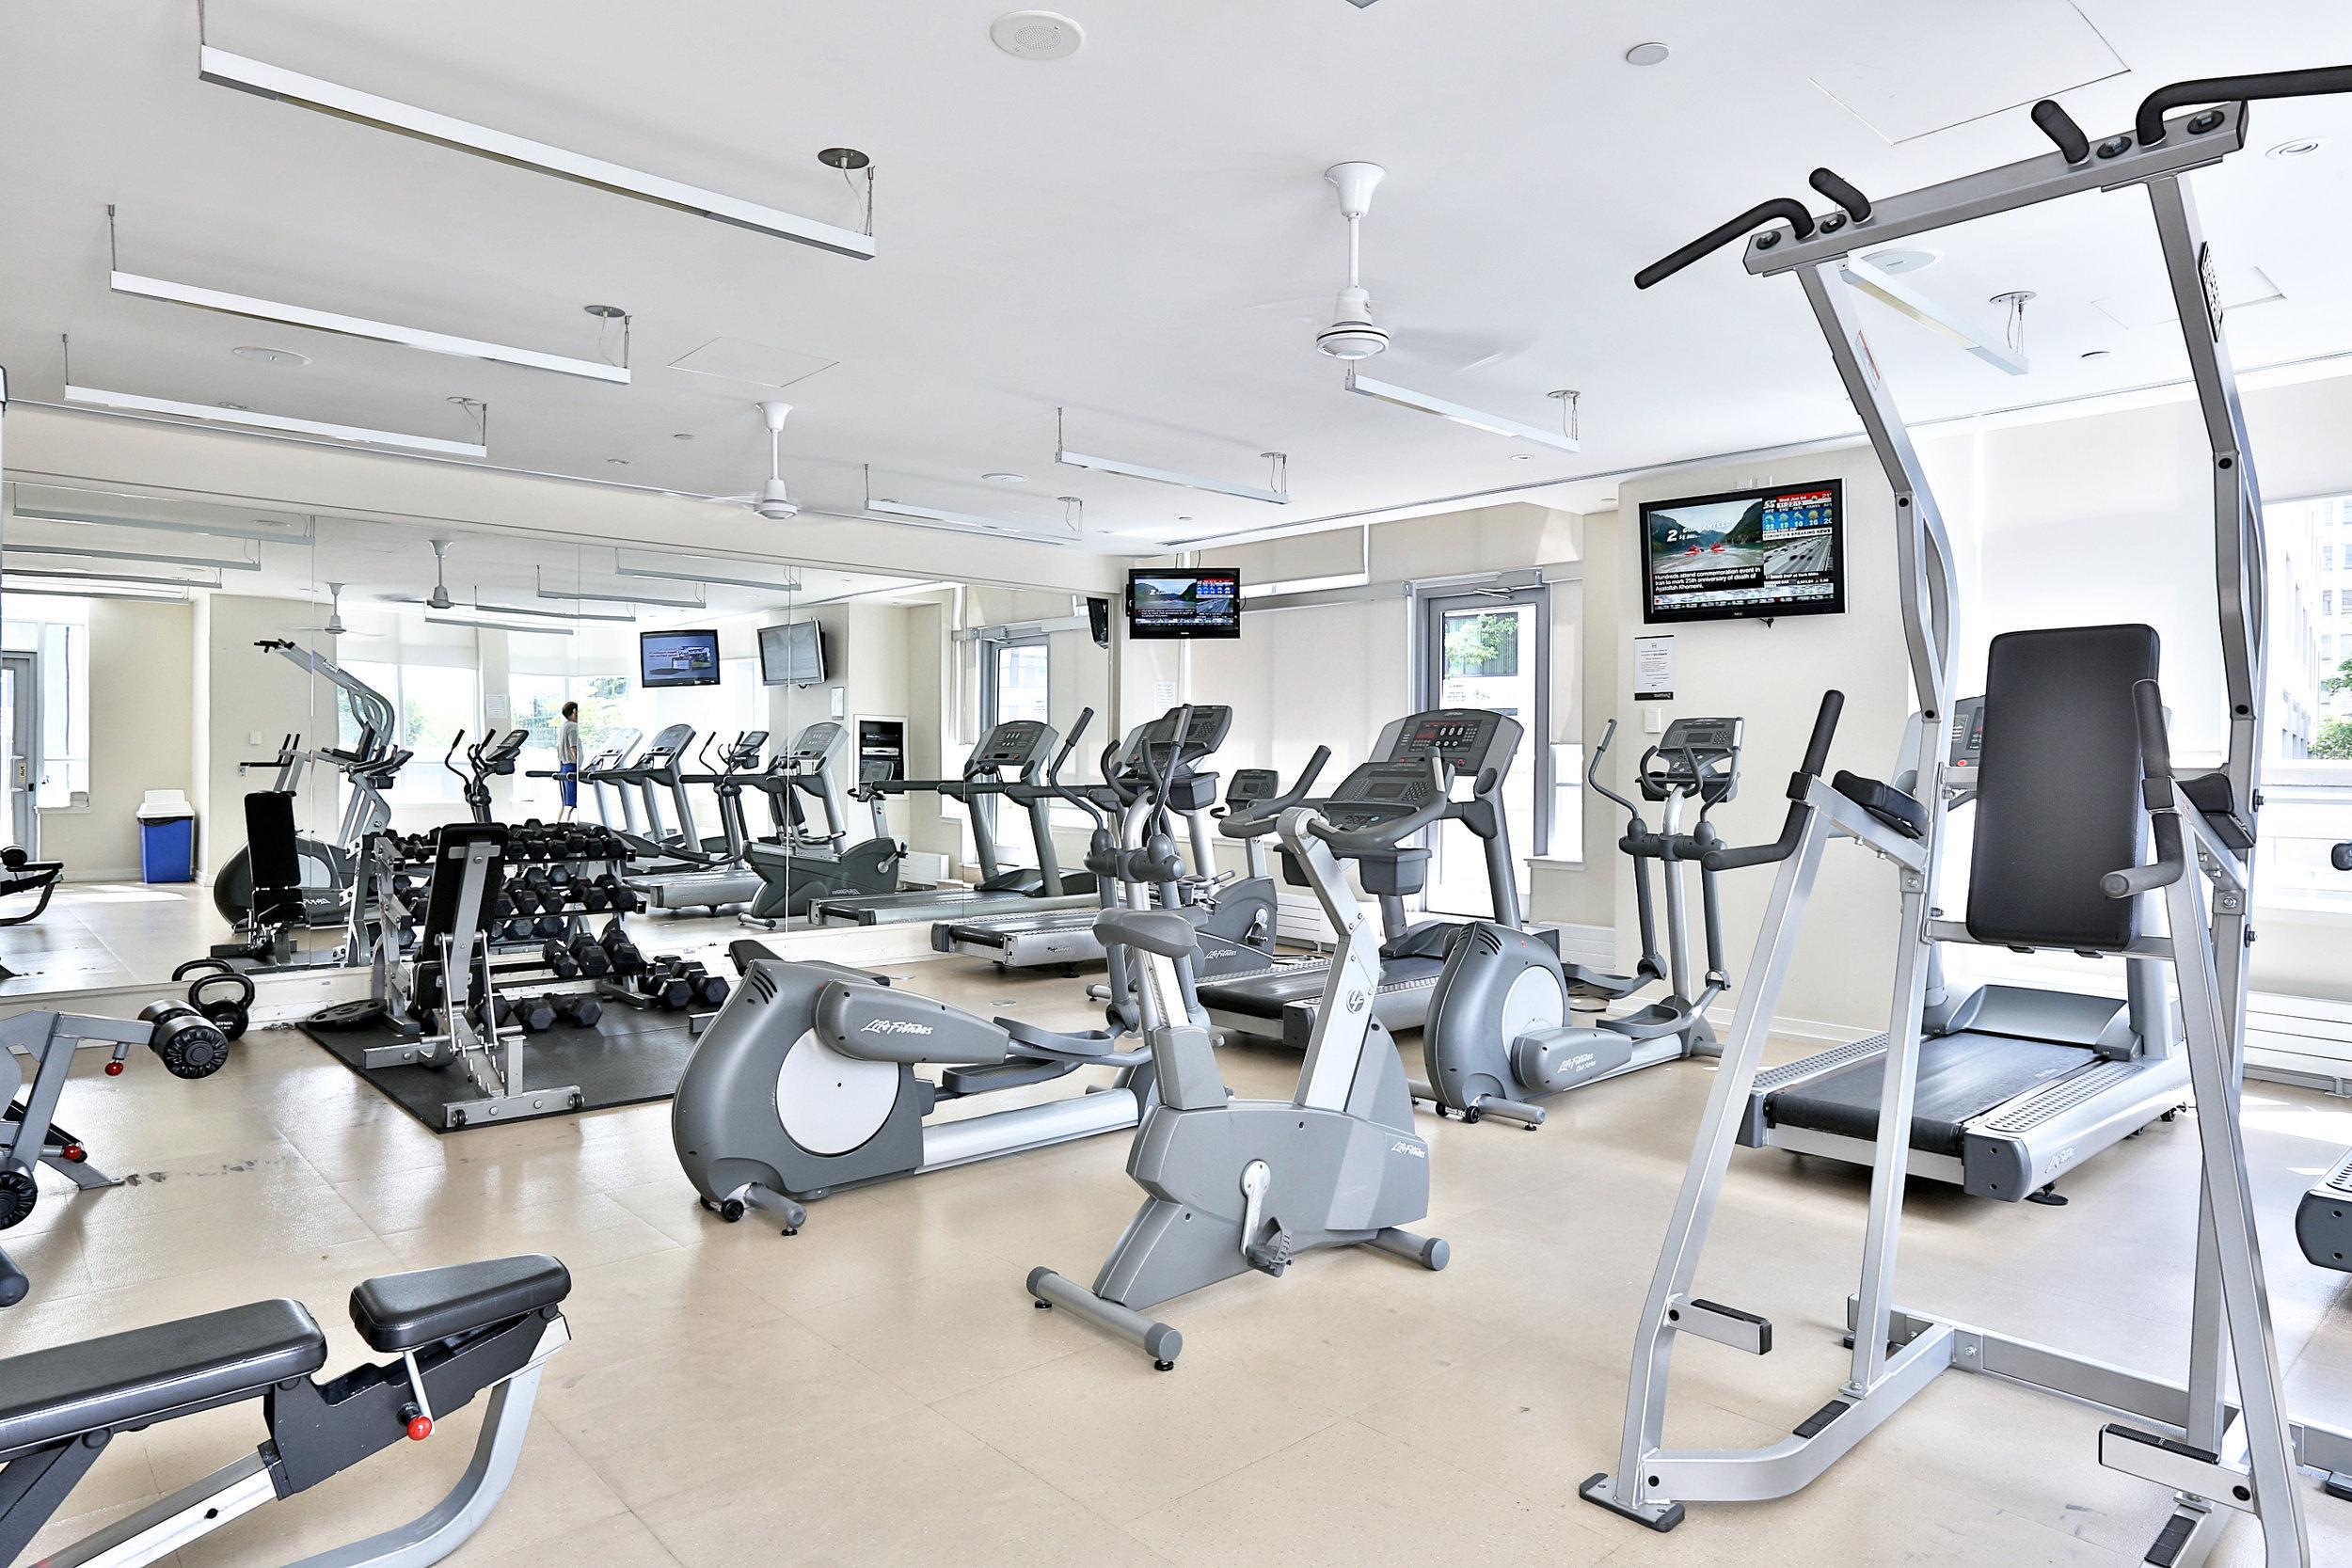 2191 Yonge Street Fitness Room Slavens Real Estate Toronto.jpg